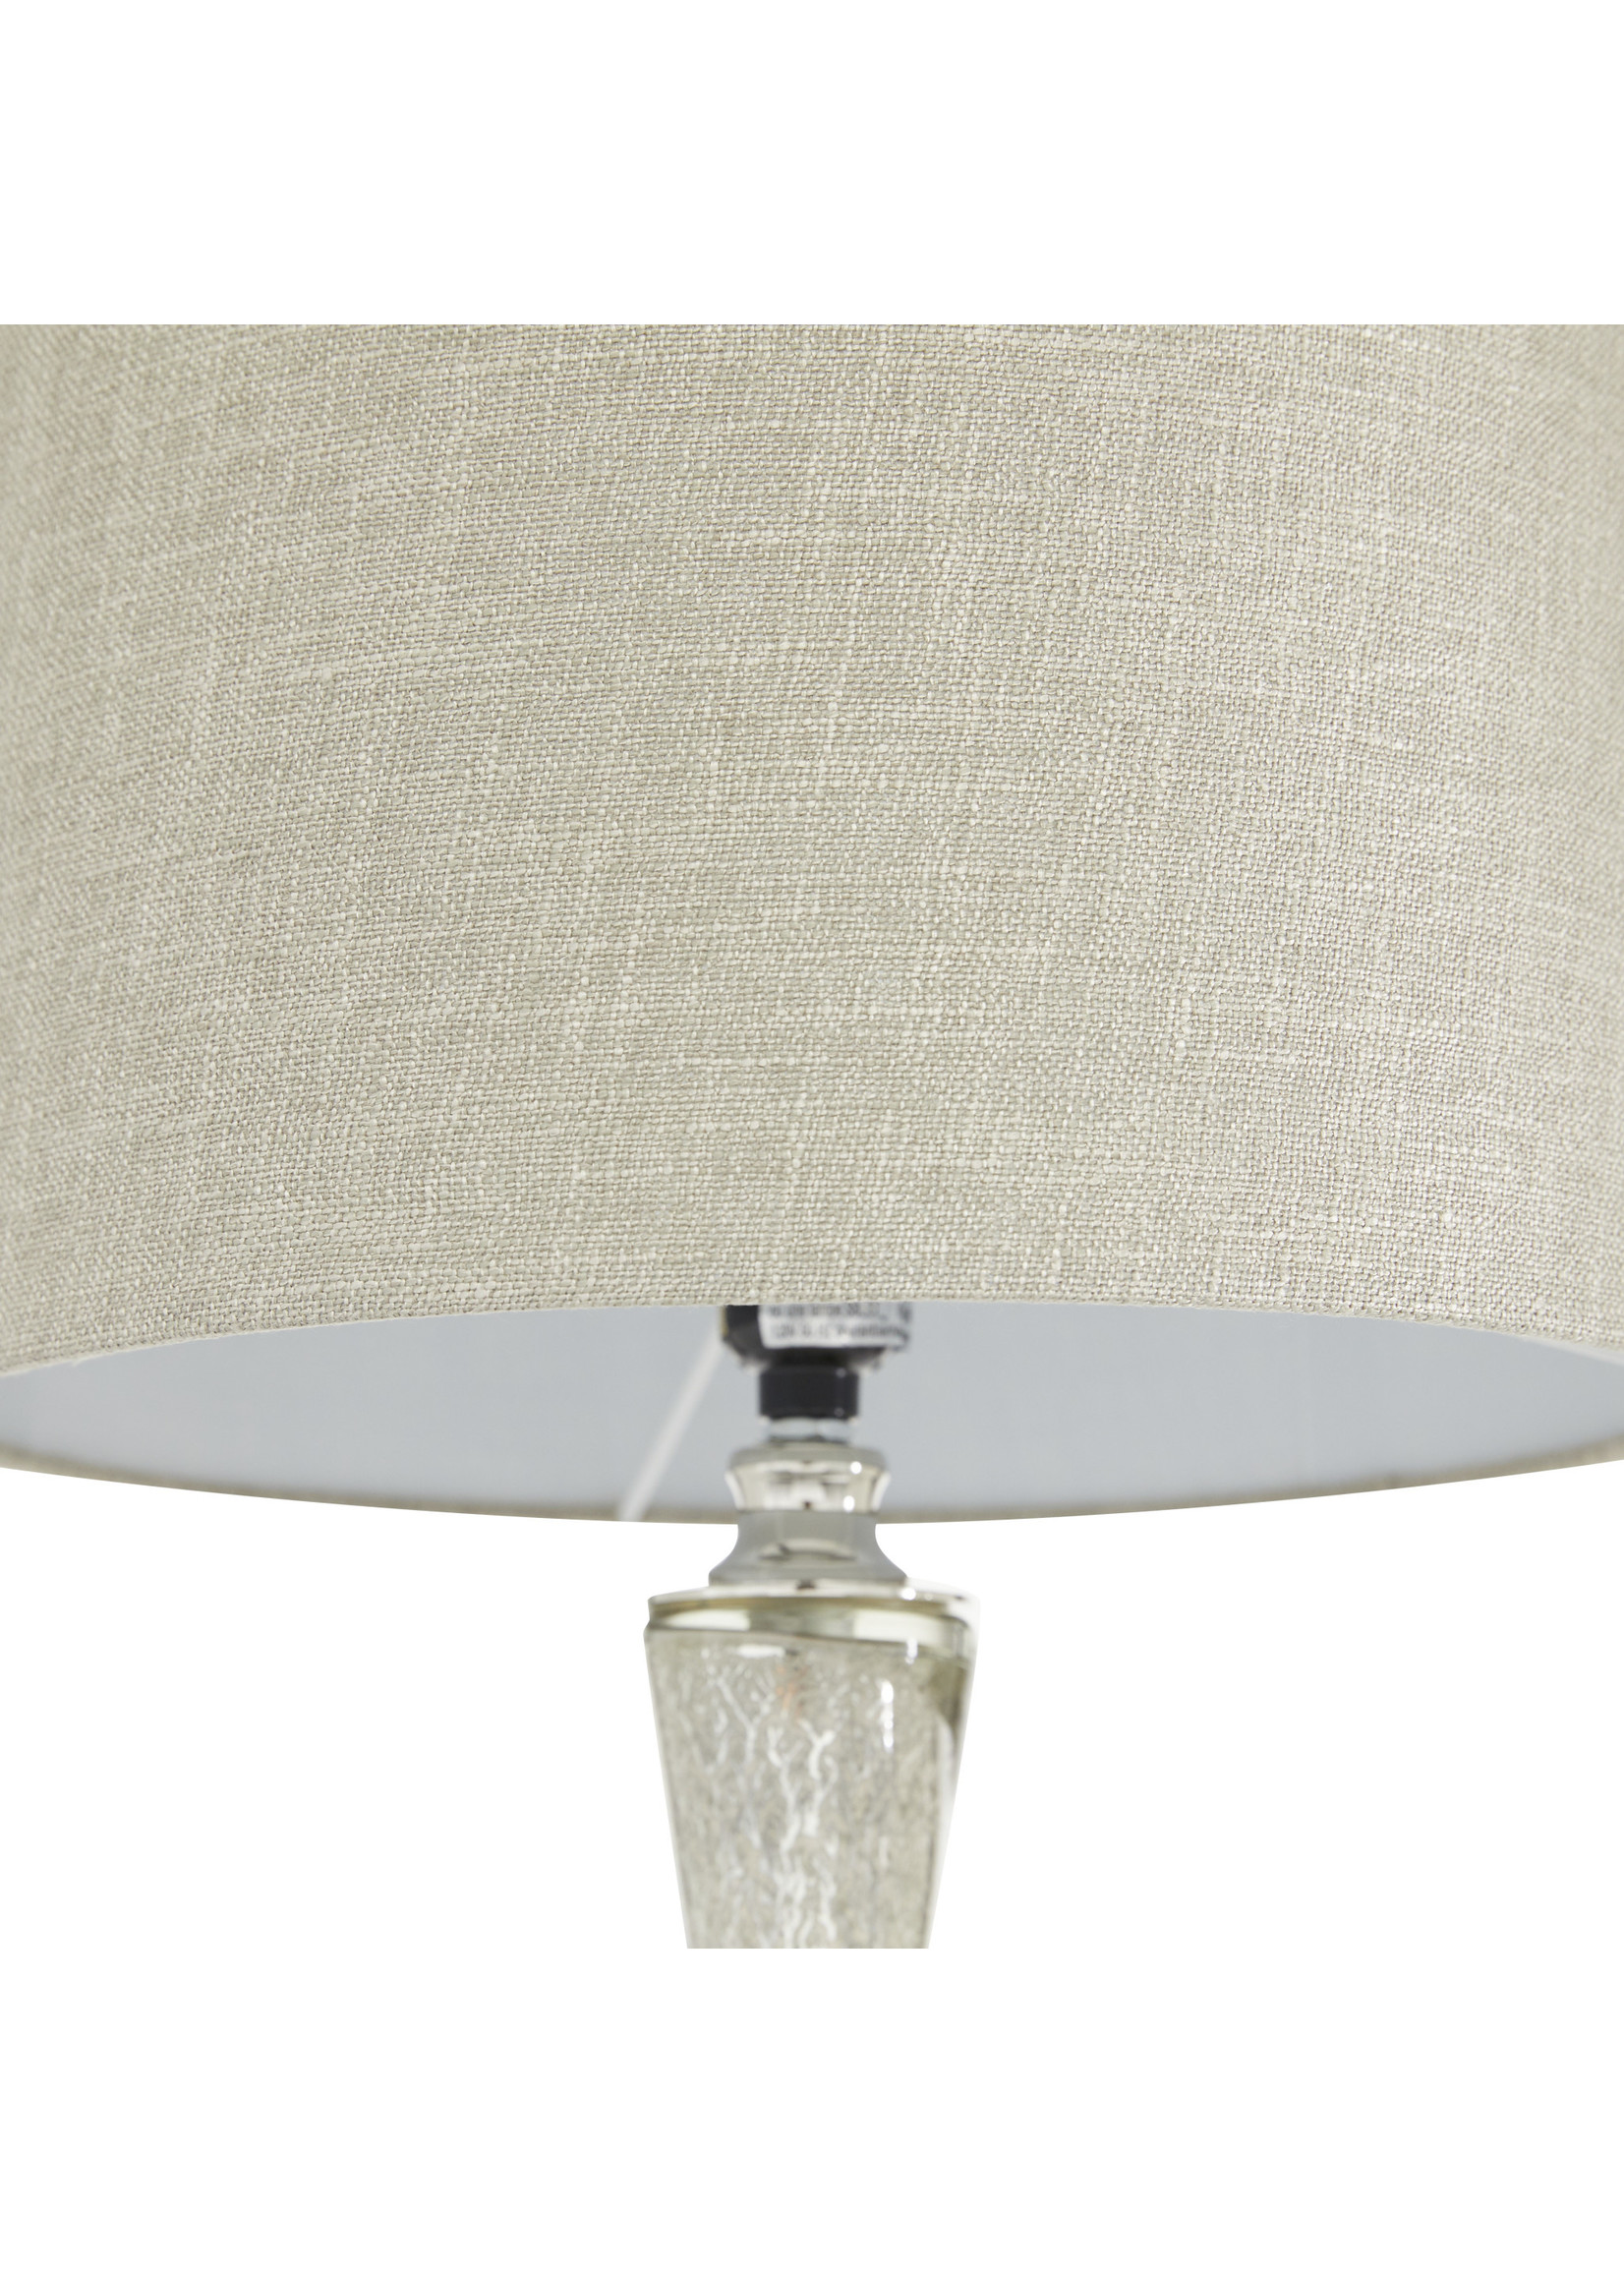 "UMA Enterprises UMA Glass Metal Table Lamp 14""W 27.5""H"